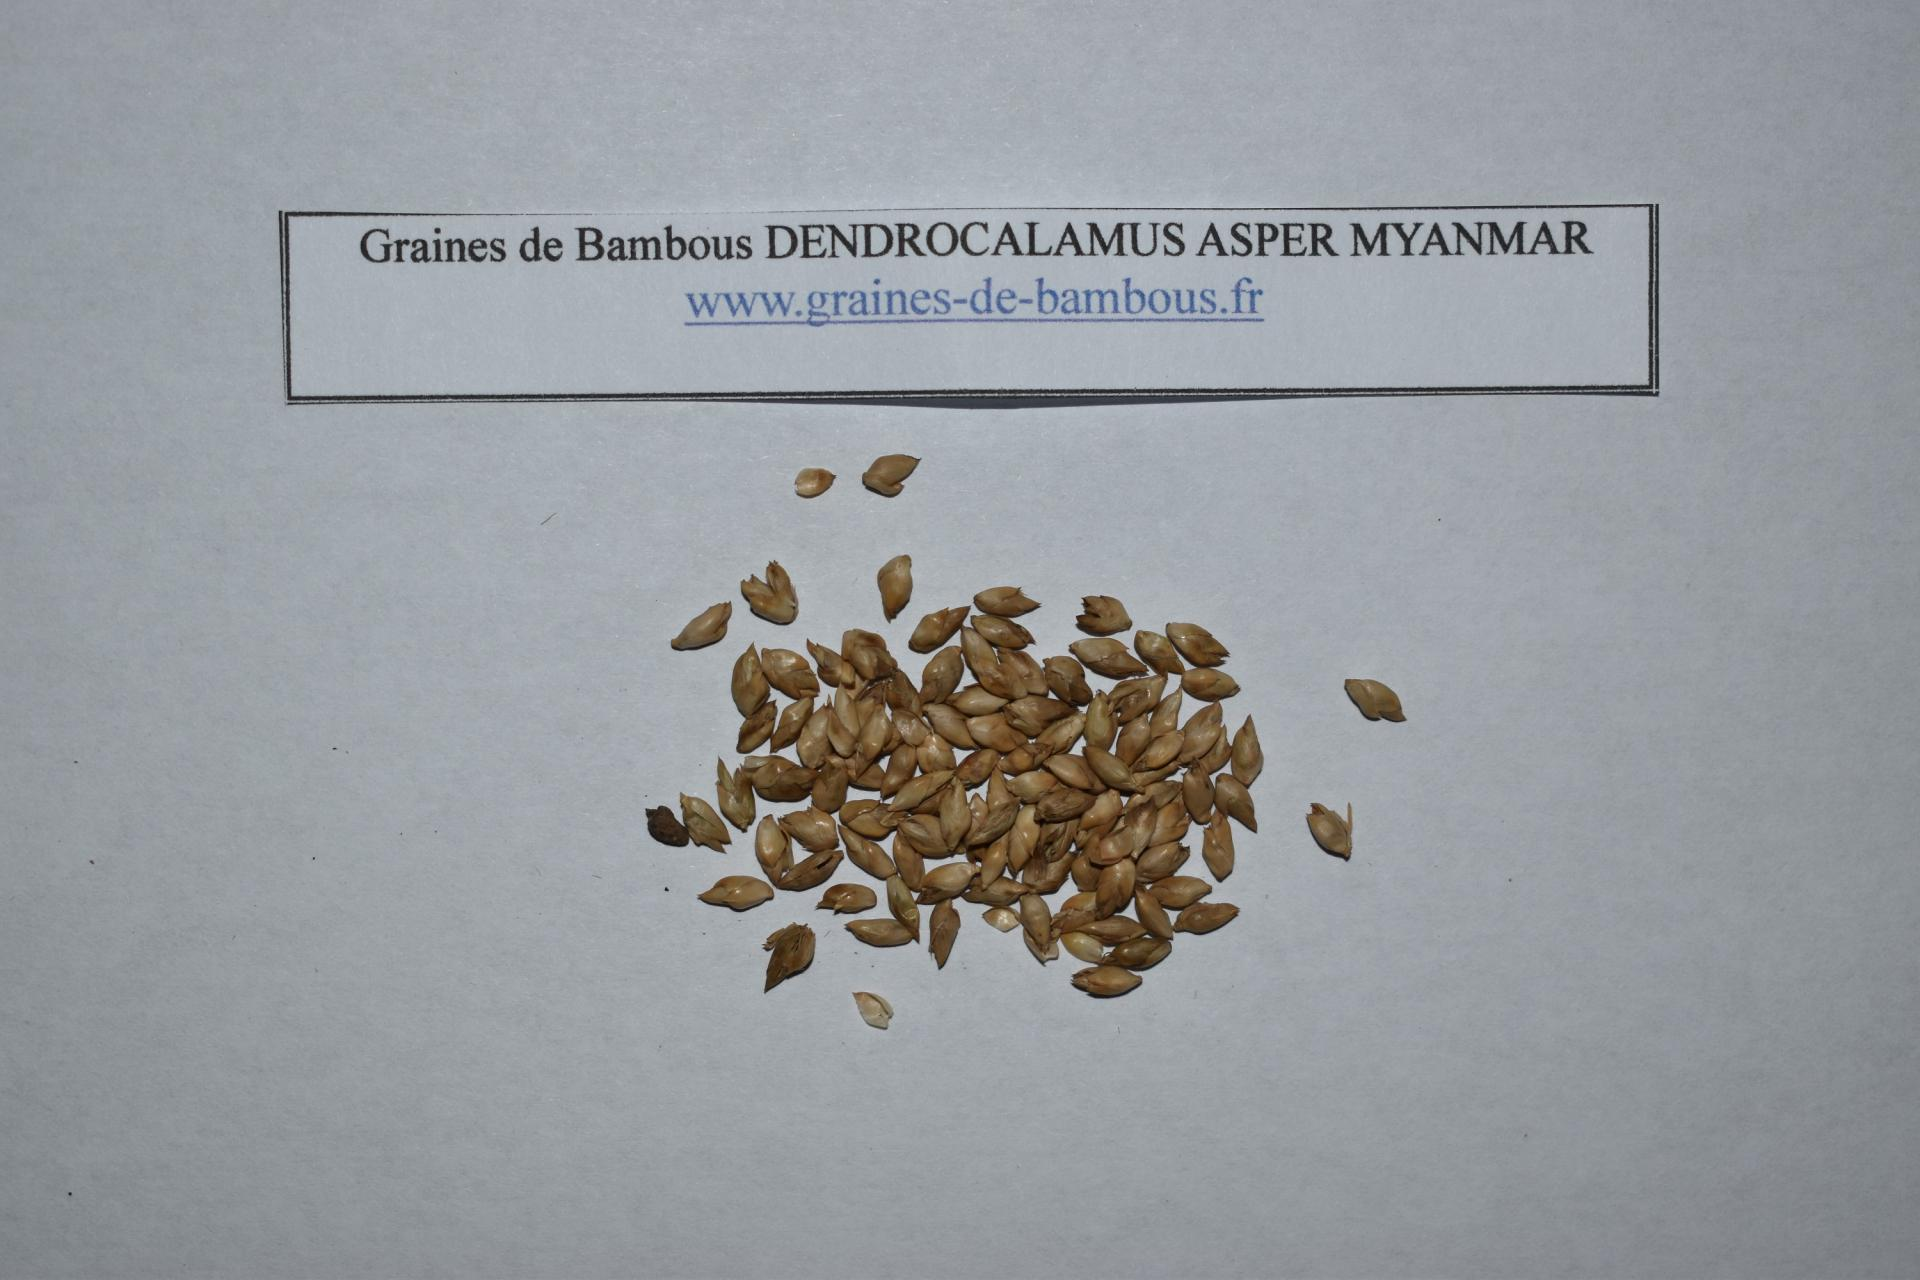 Seeds dendrocalamus myanmar graines de bambous fr